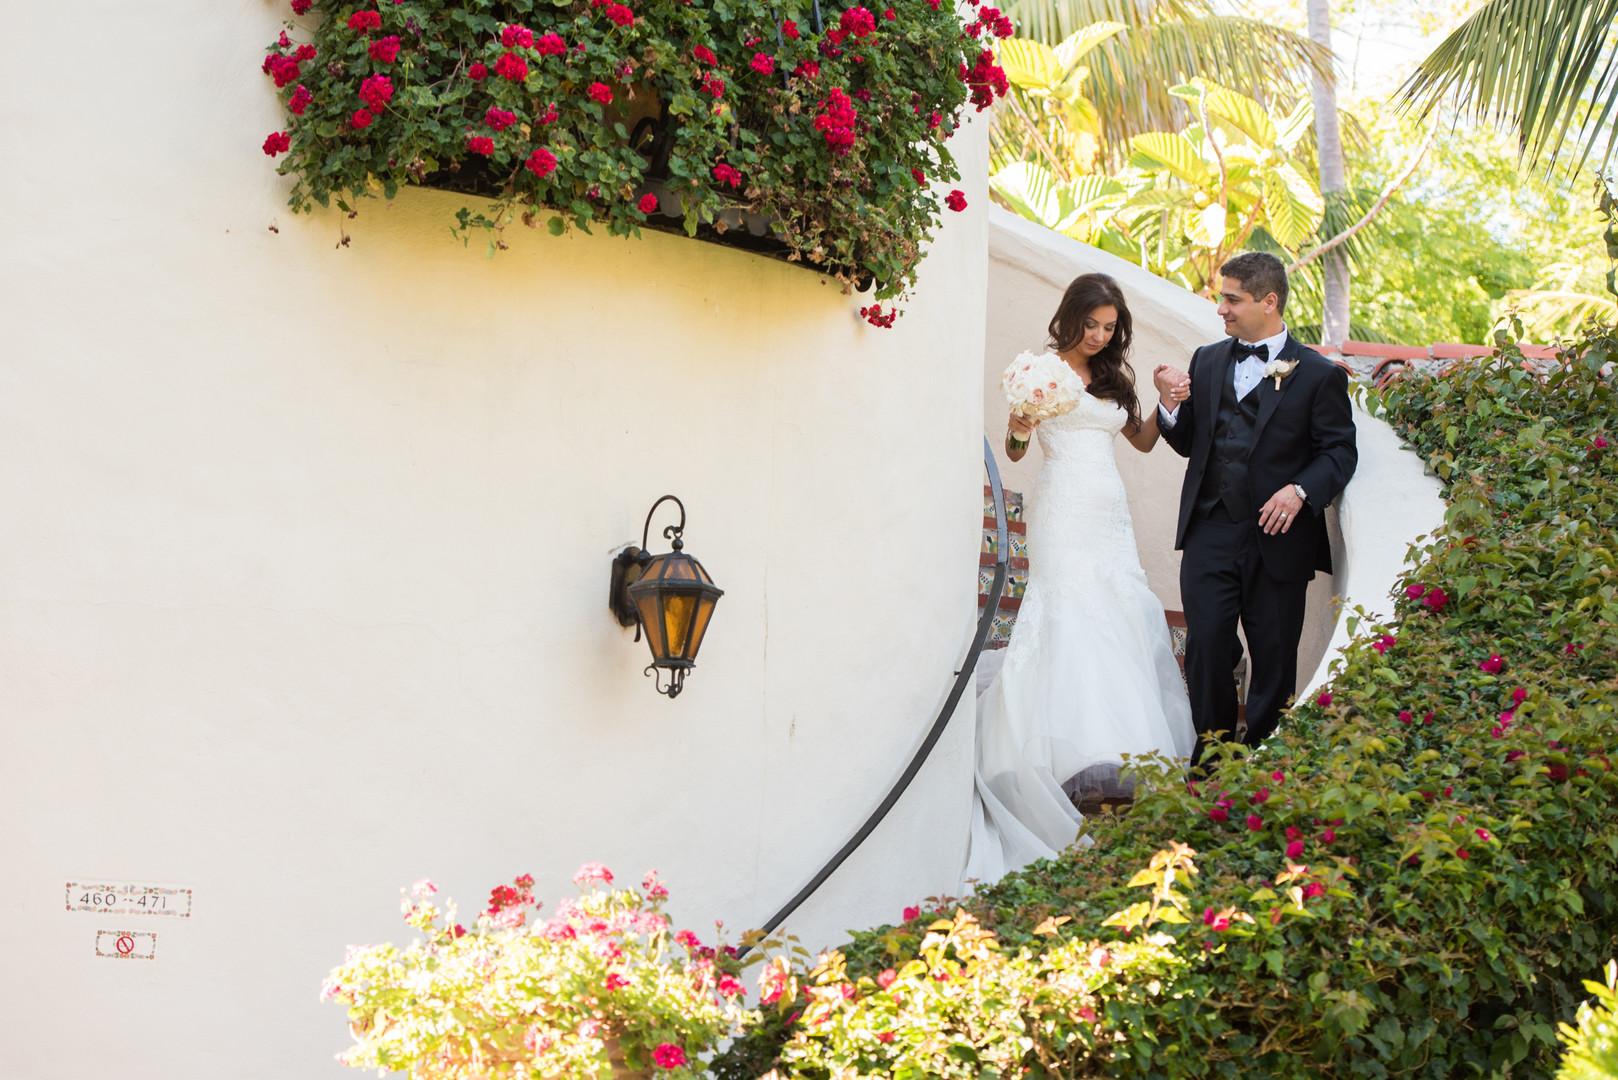 www.santabarbarawedding.com   The Big Affair   Four Seasons The Biltmore Santa Barbara   Asiel Designs   Bride and Groom